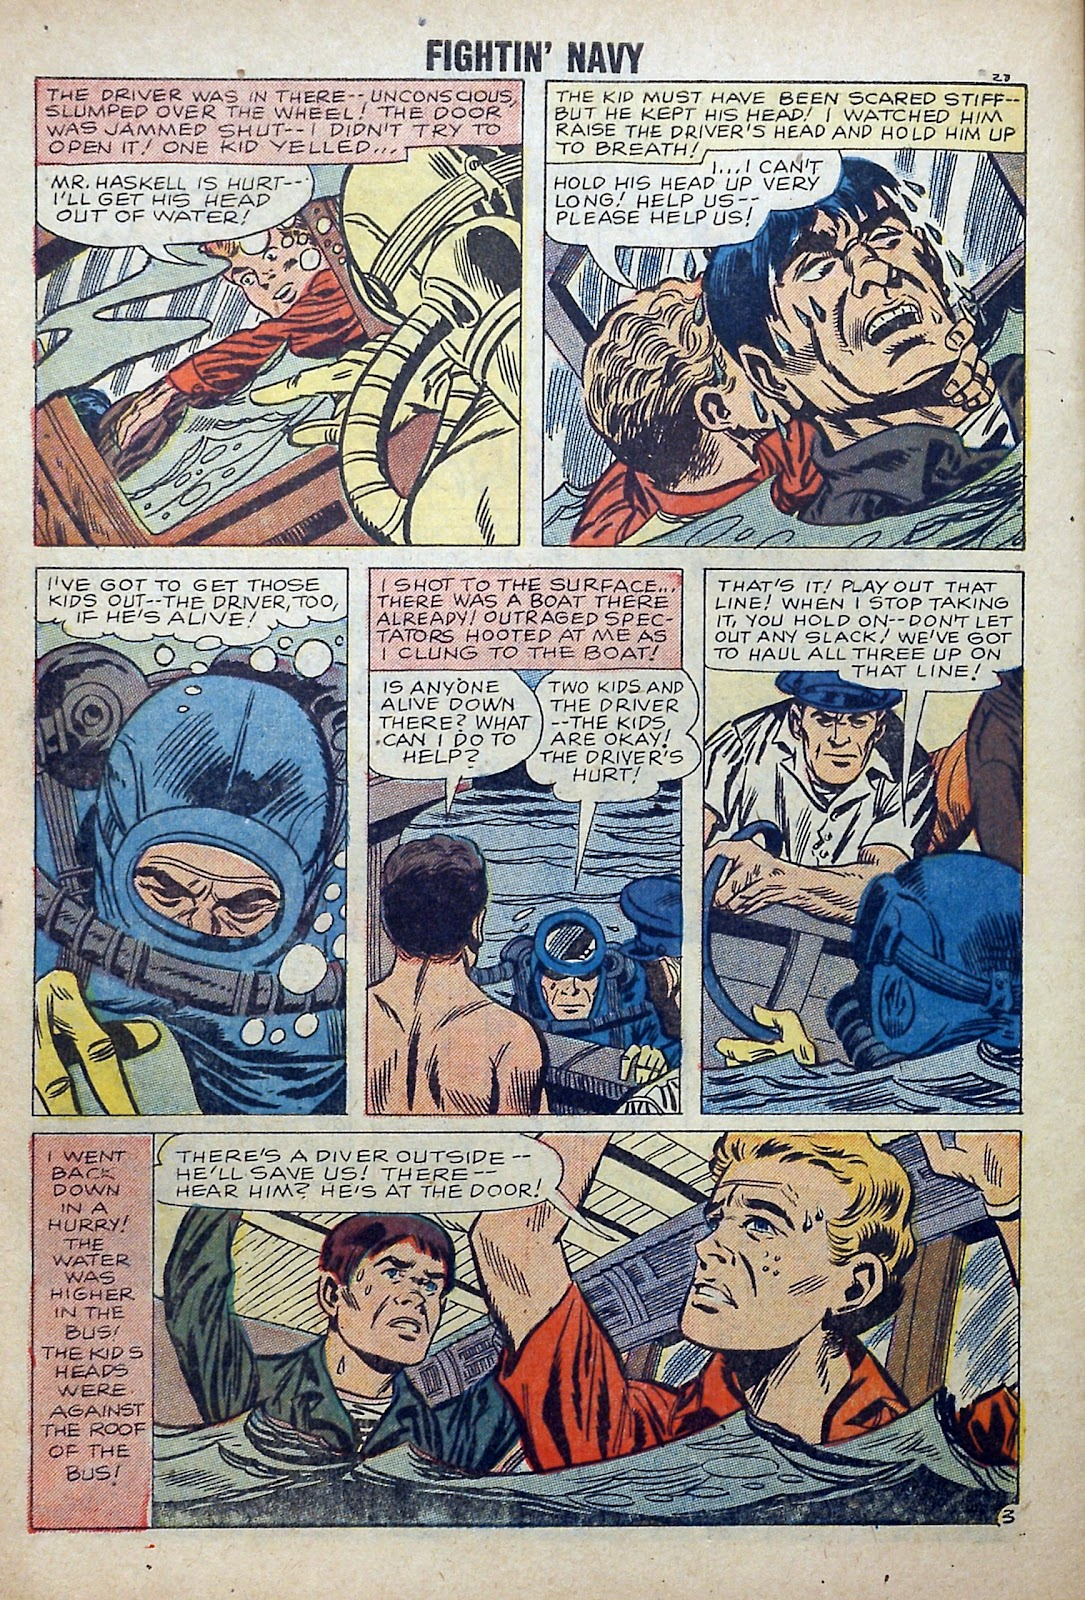 Read online Fightin' Navy comic -  Issue #84 - 30